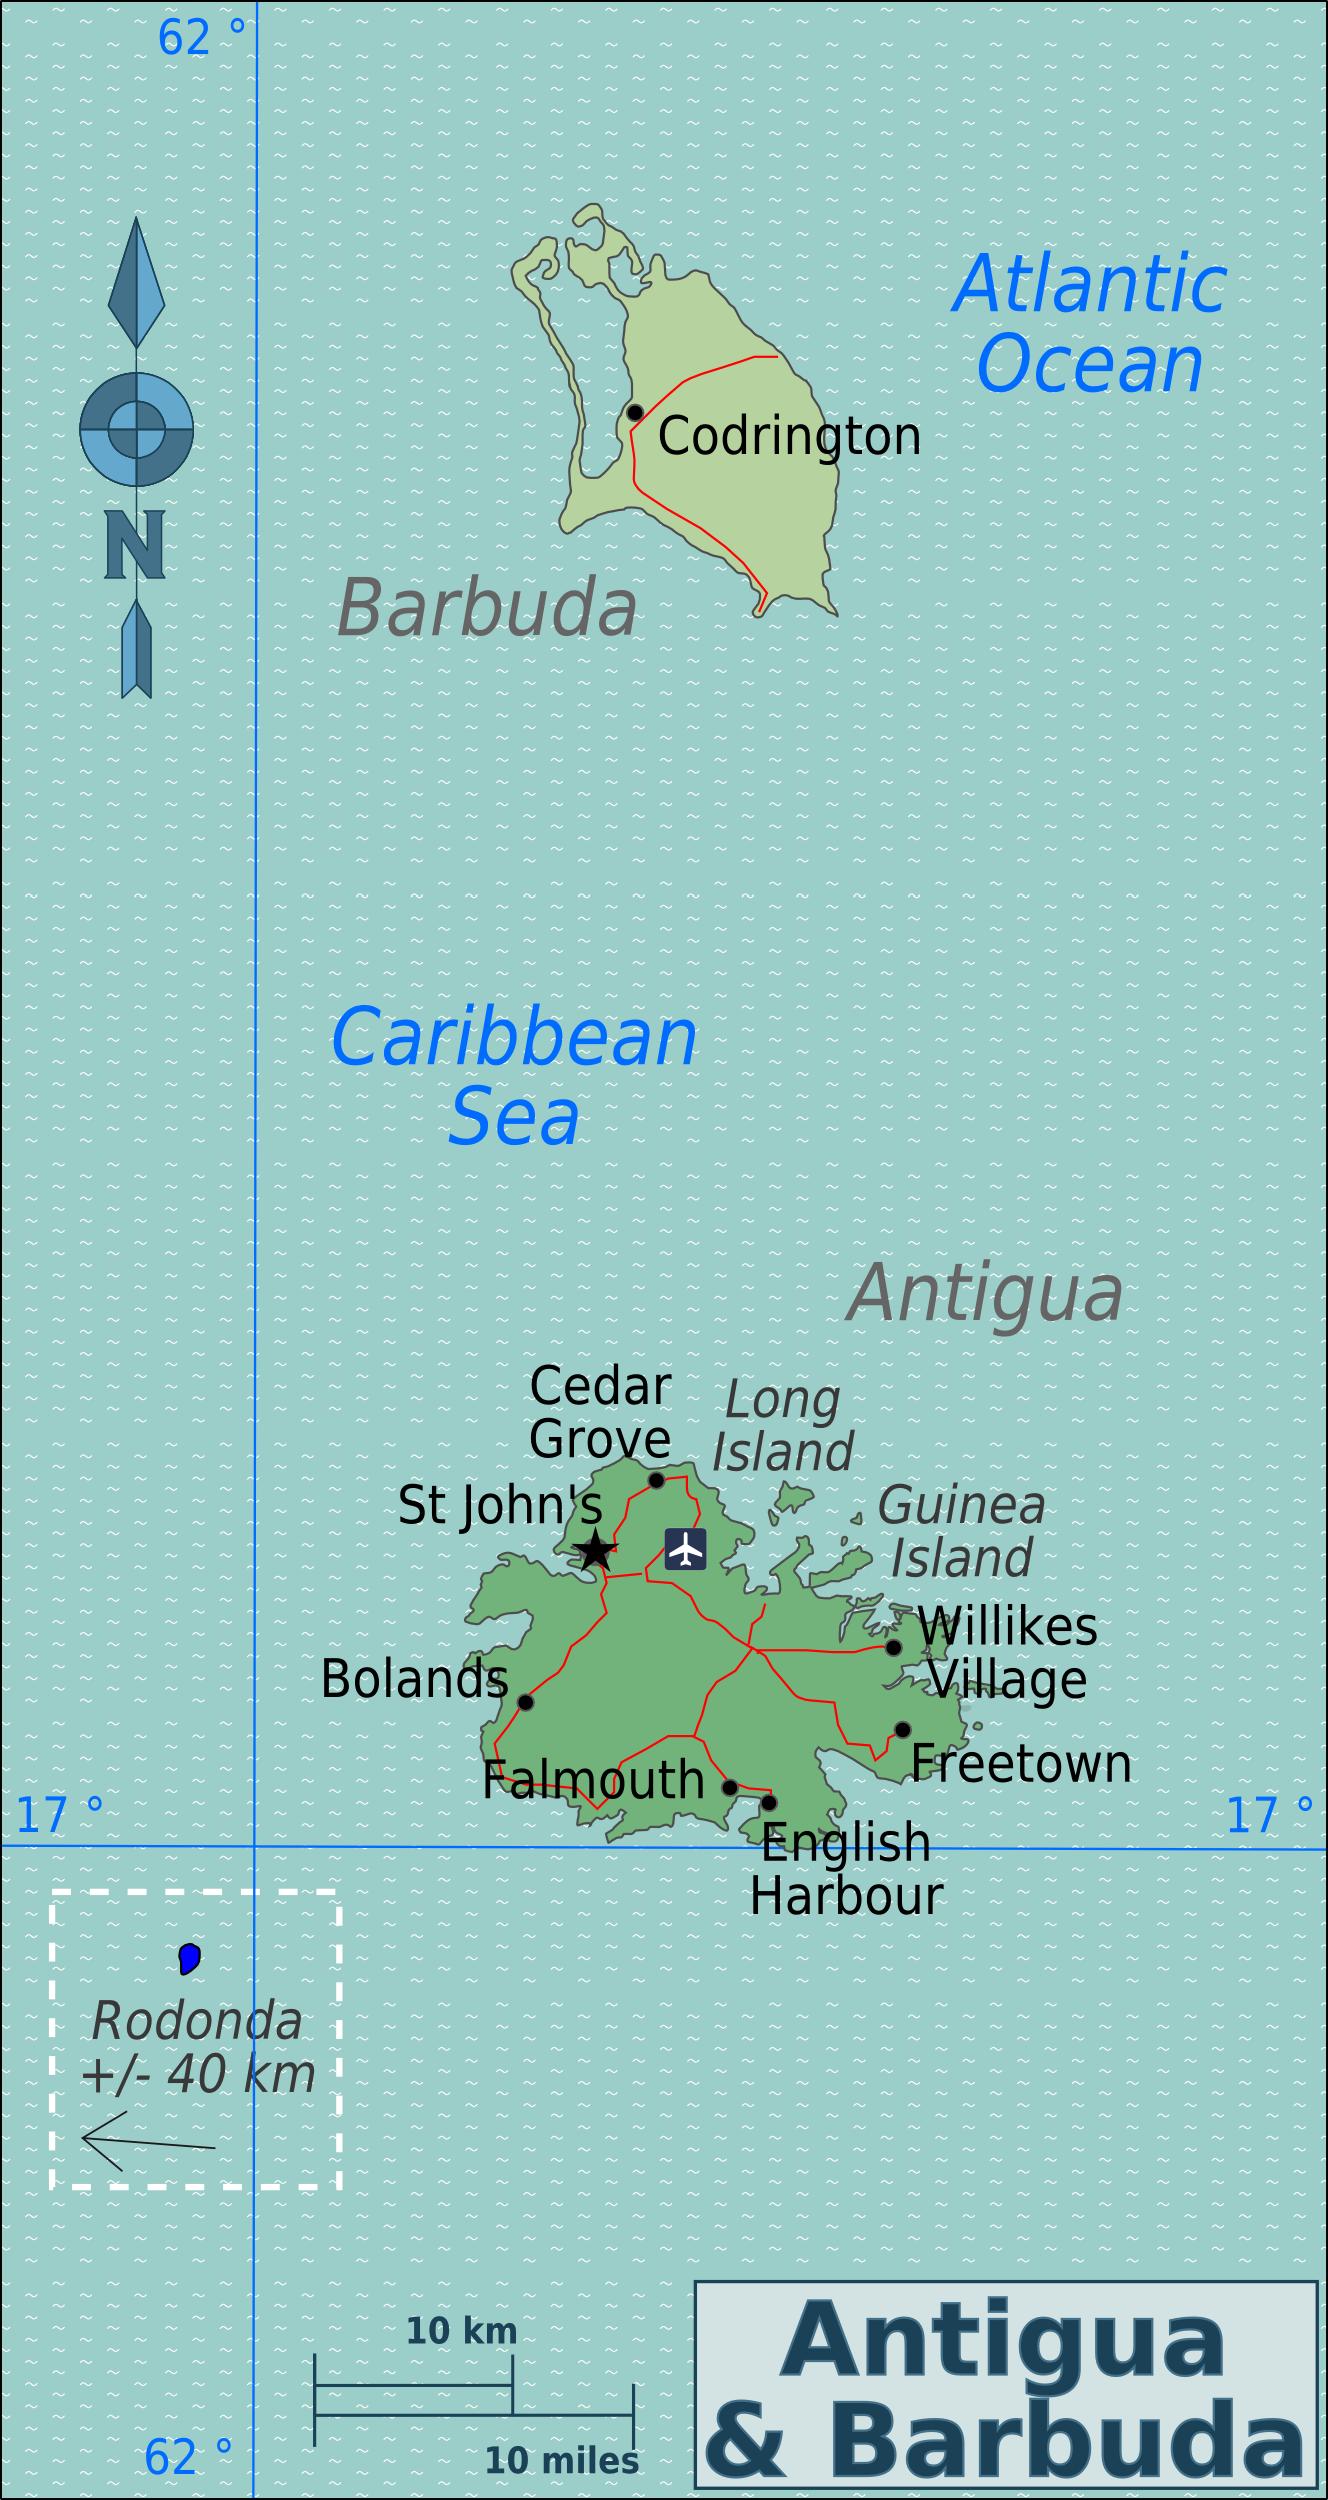 Karte Antigua und Barbuda (Übersichtskarte) : Weltkarte.com - Karten ...